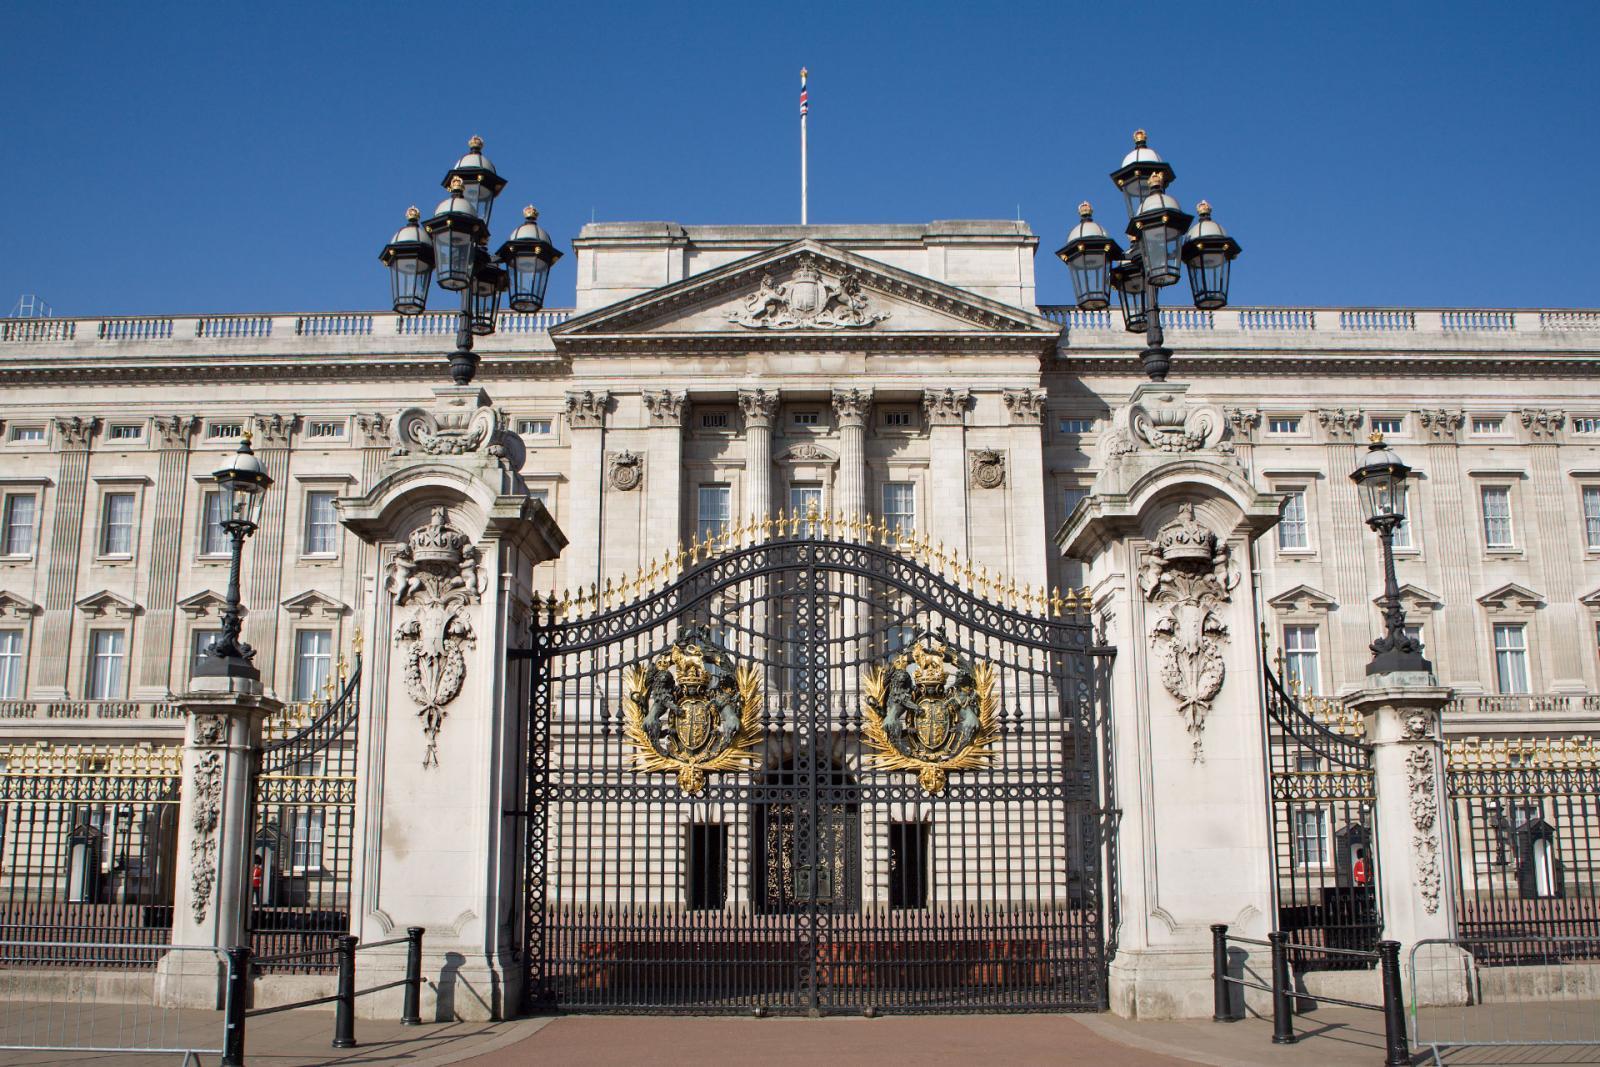 Top Hotels In London